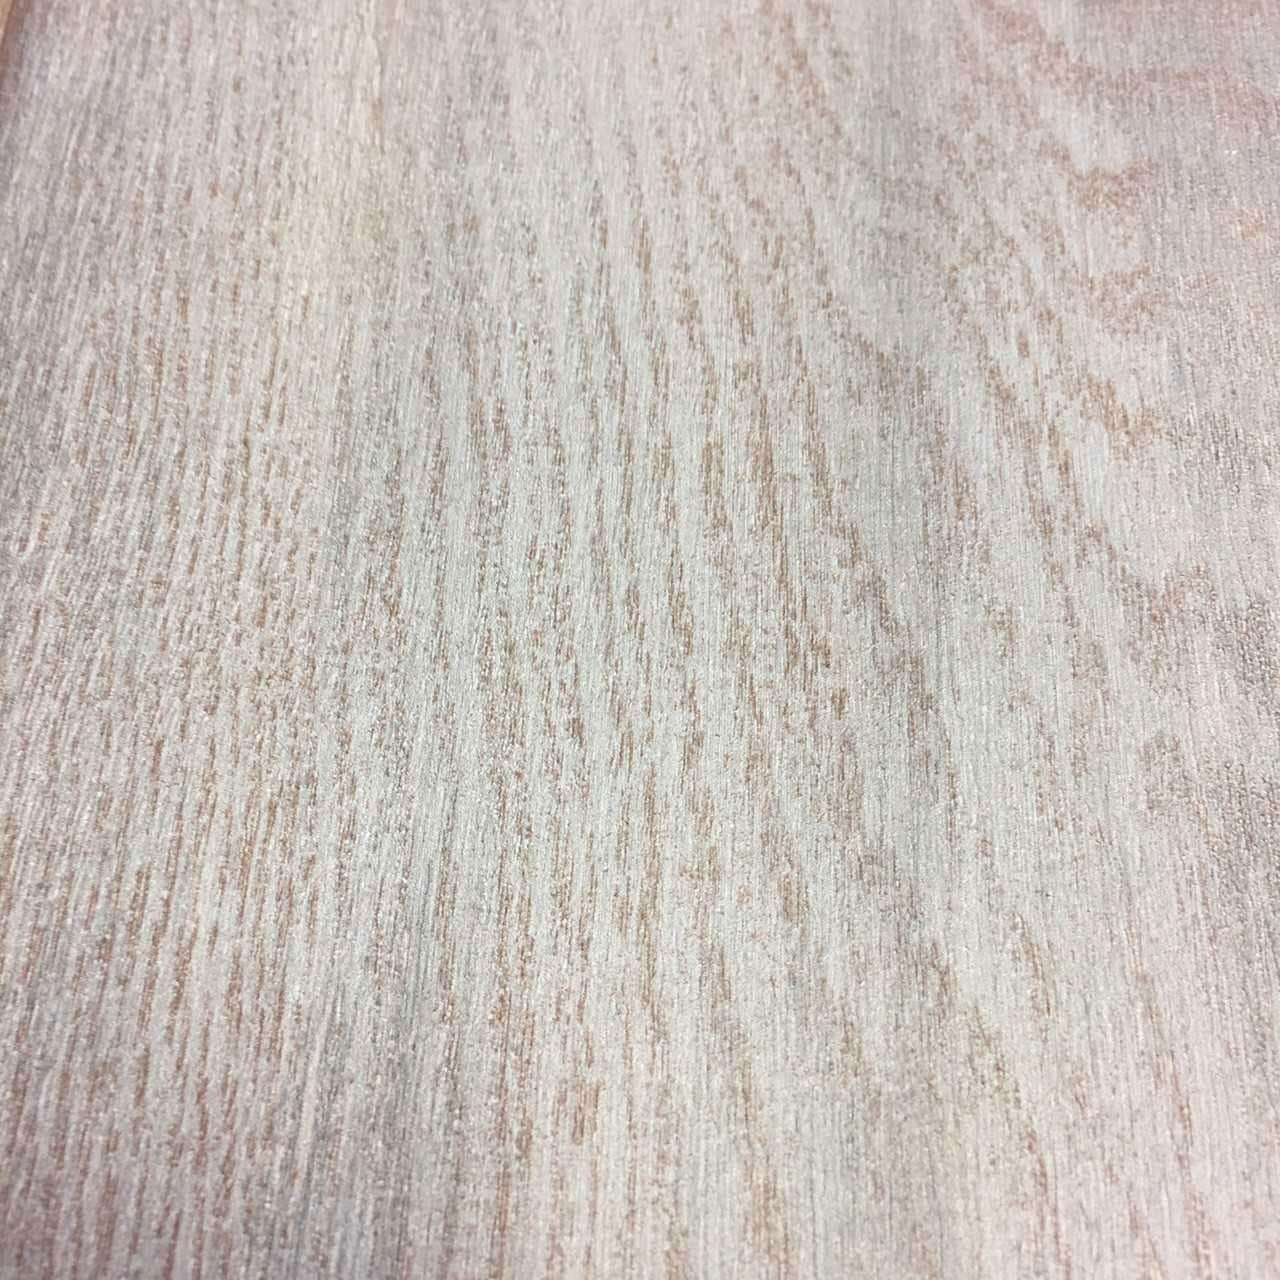 Wood-Effect-Wallpaper-Grains-Boards-Planks-Paste-The-Wall-Vinyl-Koziel-3-Colours thumbnail 12